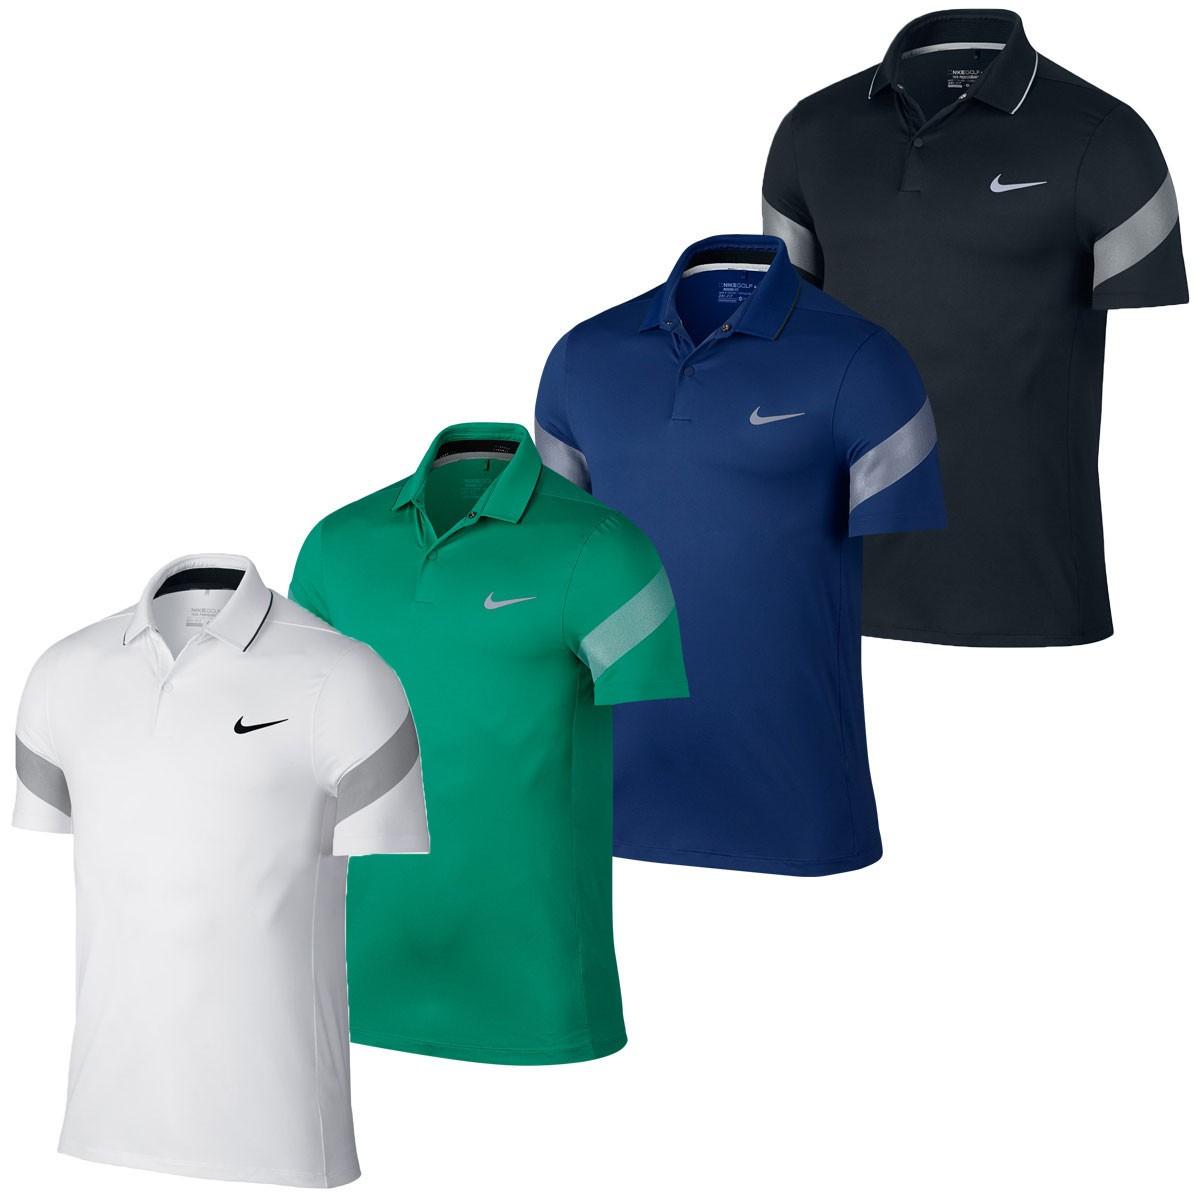 49d7f076803d6 Nike Golf Mens MM Fly Framing Commander Dri-FIT Polo Shirt - Nike ...